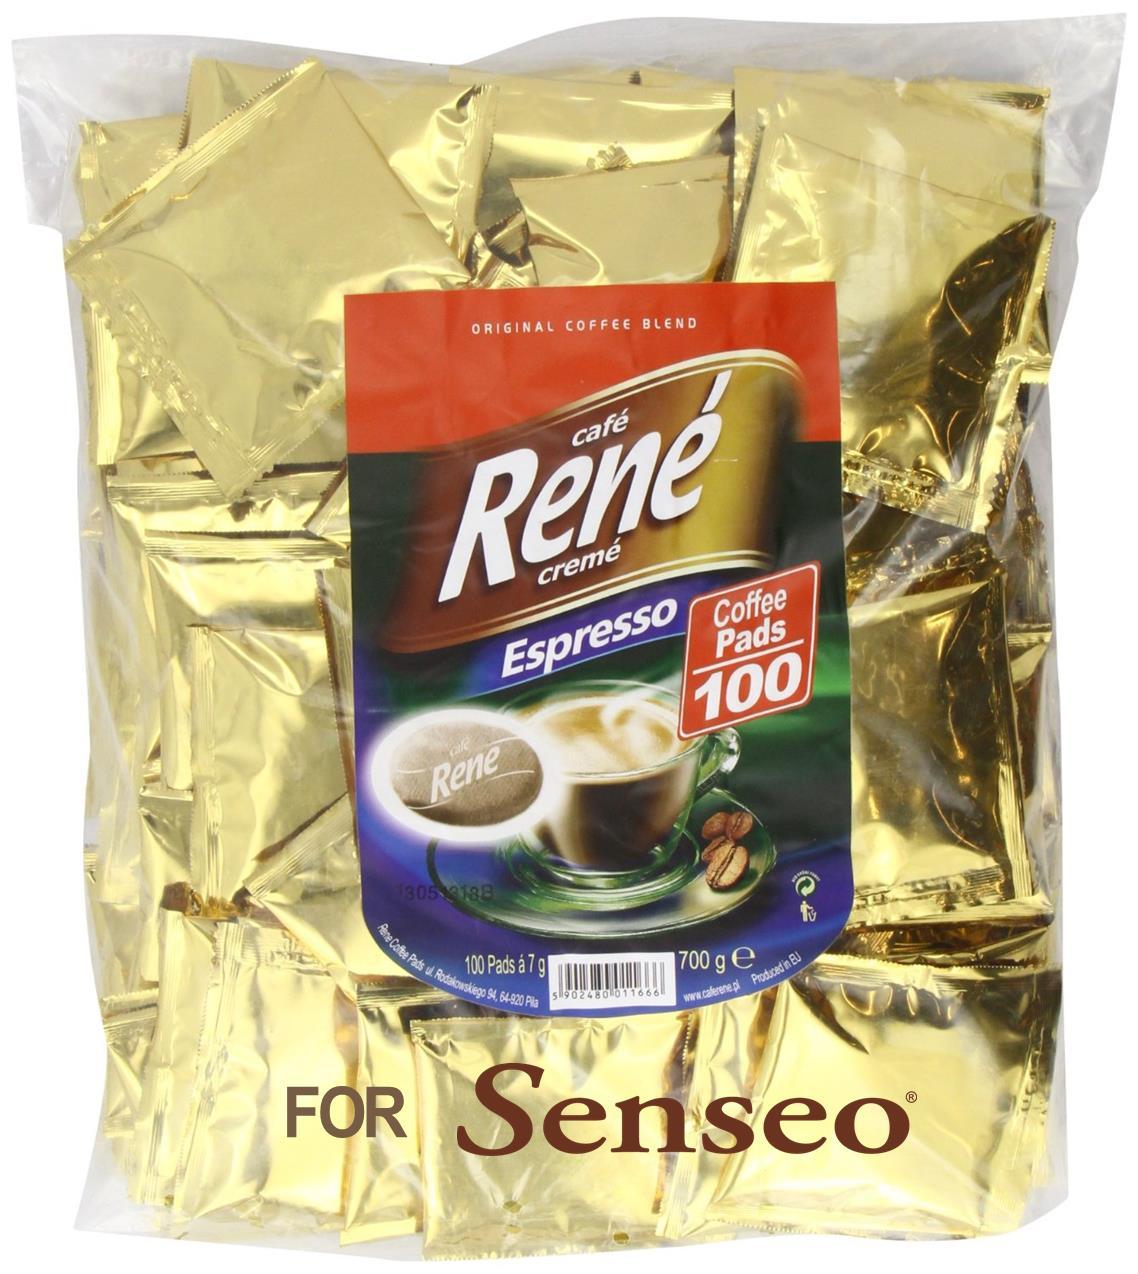 philips senseo 100 x caf rene cr me espresso coffee pads. Black Bedroom Furniture Sets. Home Design Ideas